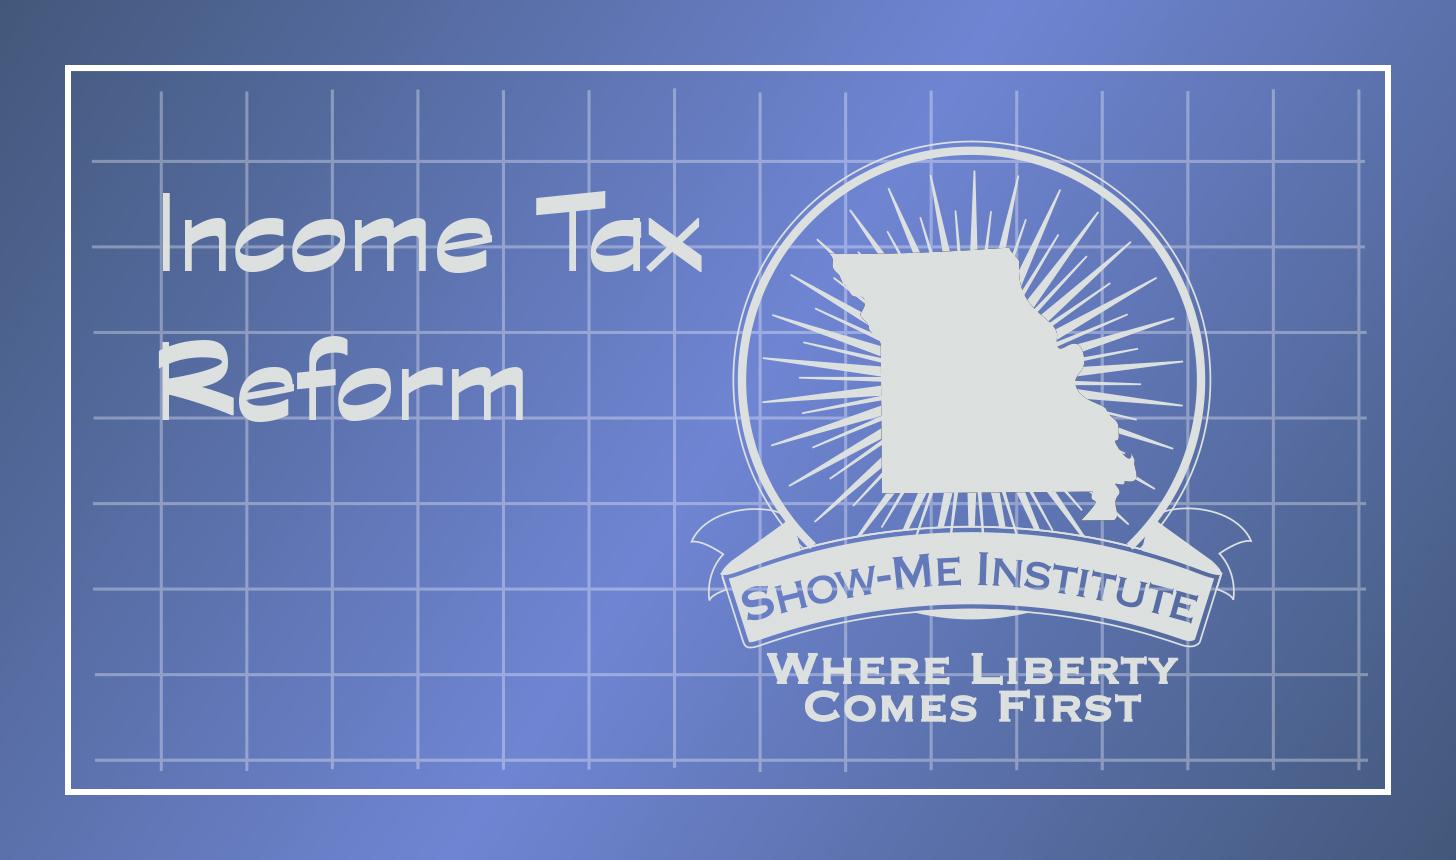 2018 blueprint income tax reform show me institute 2018 blueprint income tax reform malvernweather Choice Image